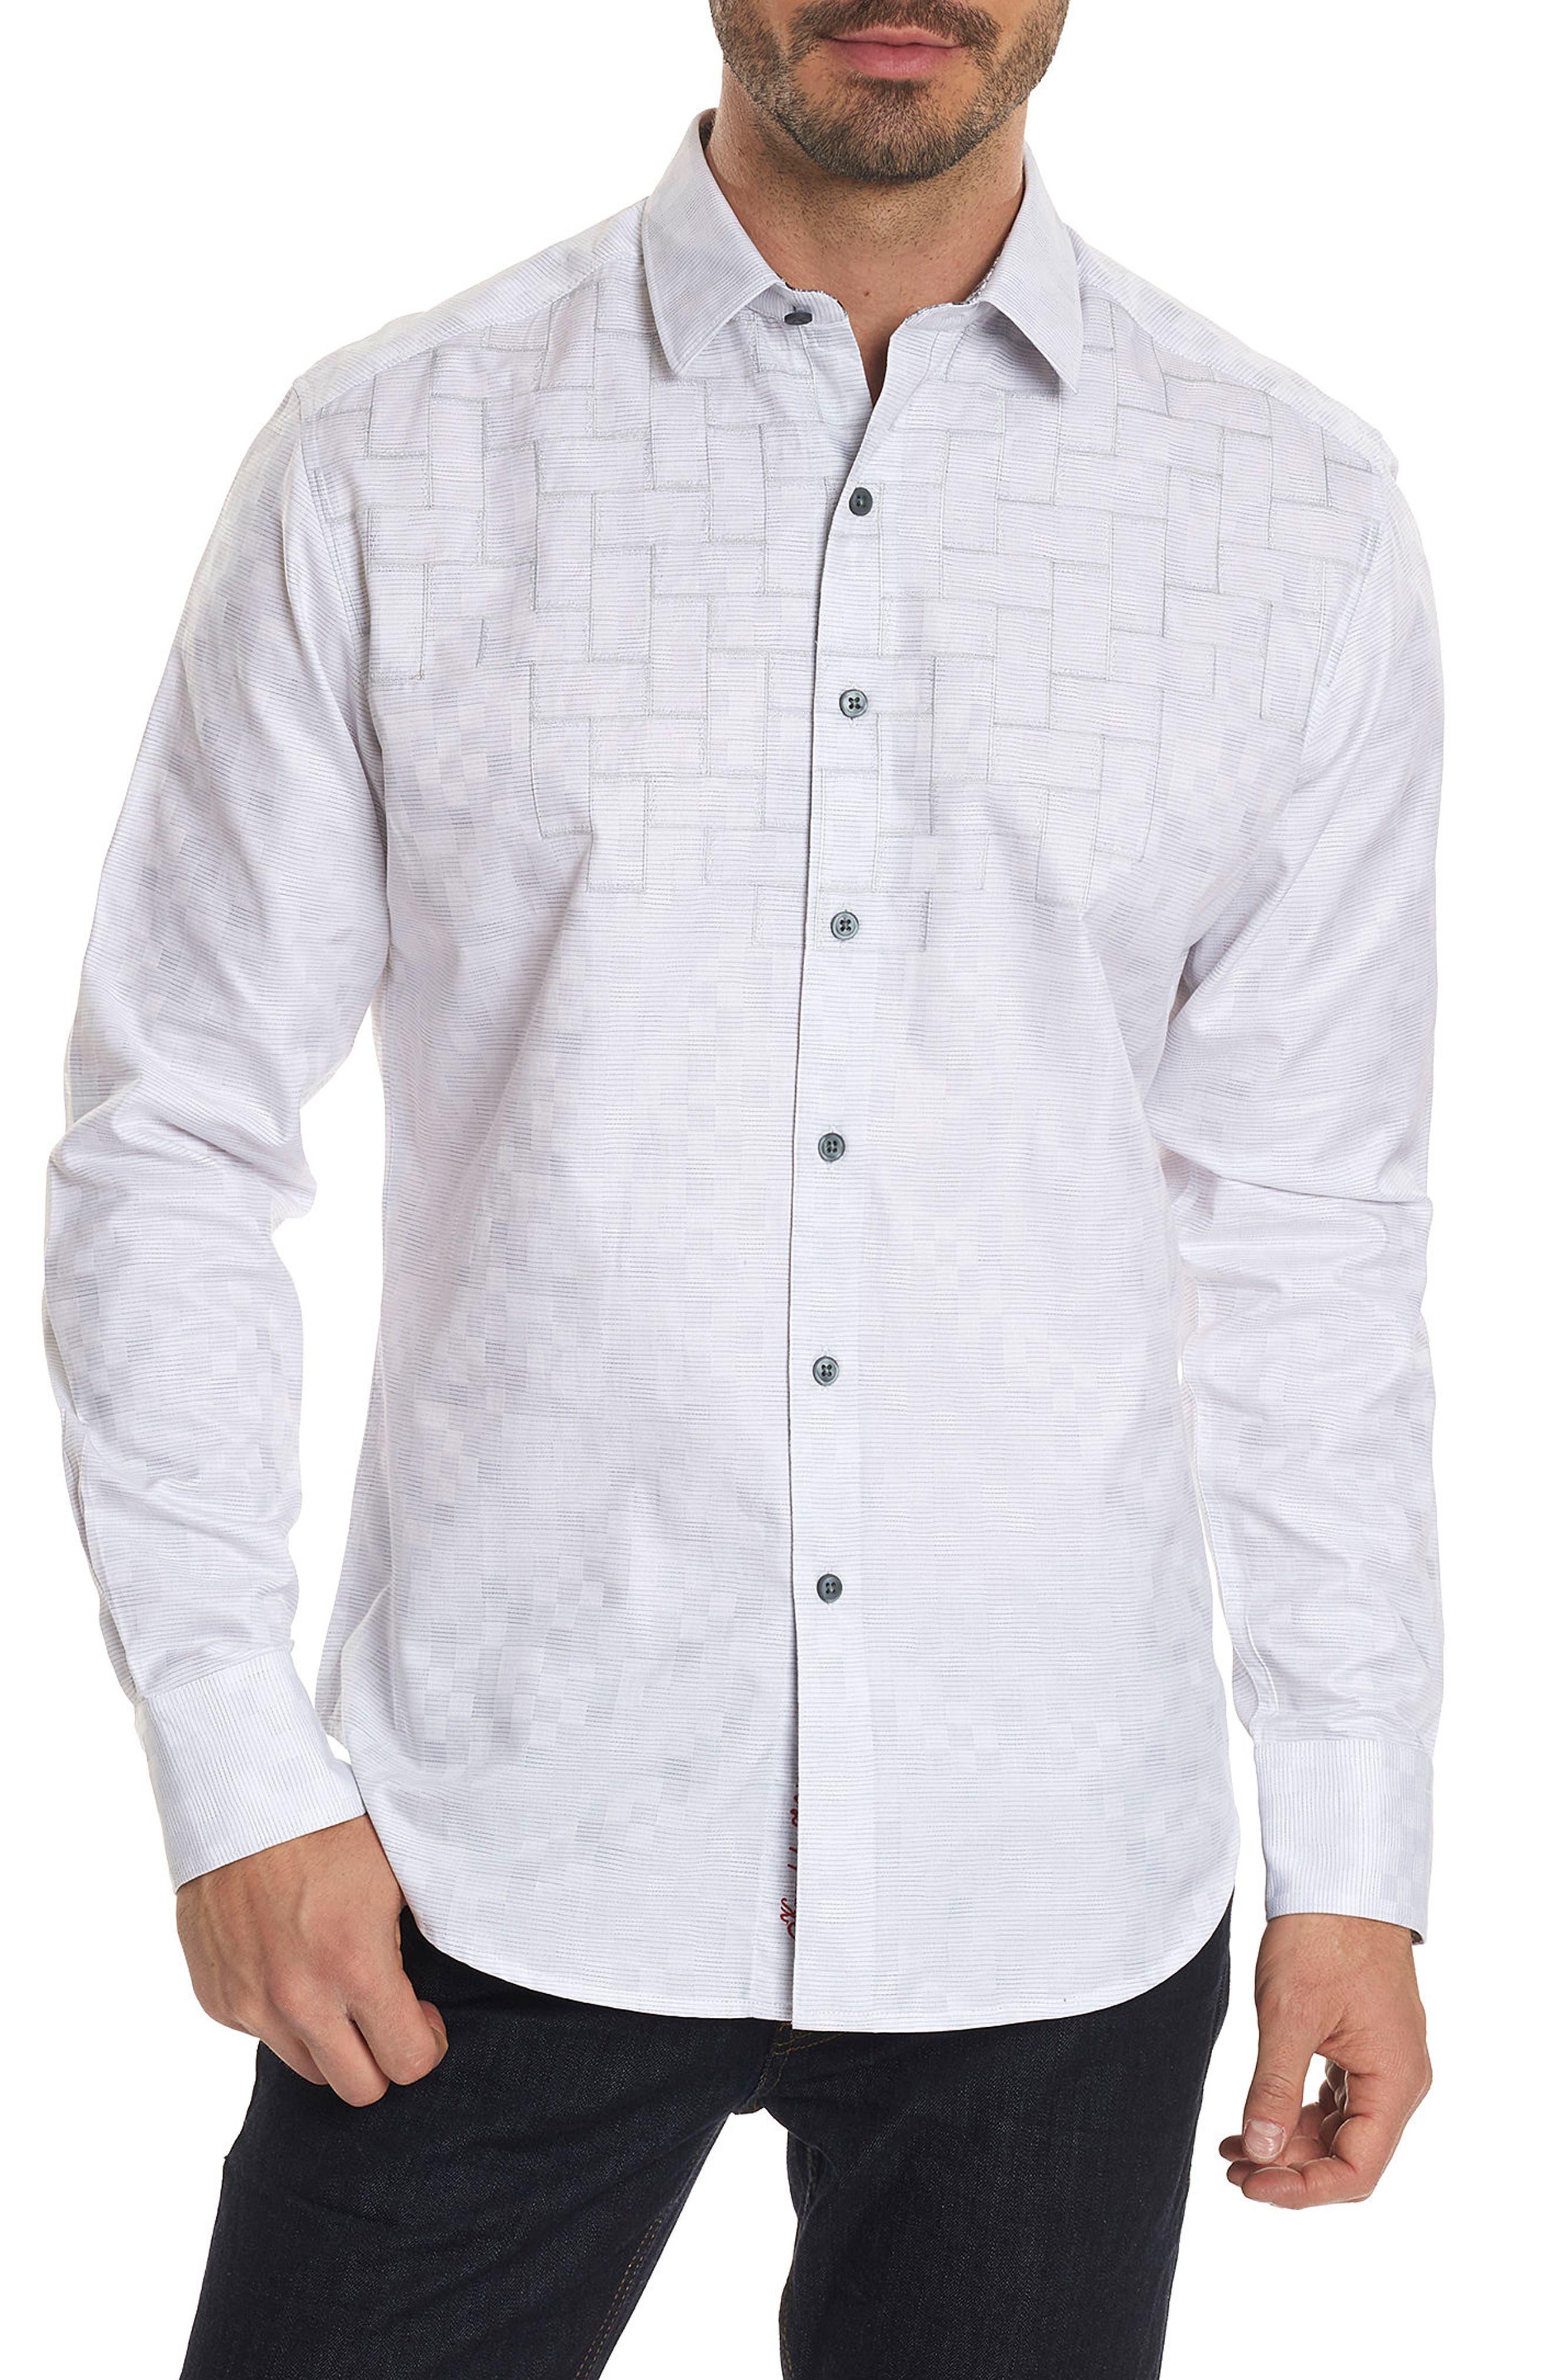 Main Image - Robert Graham Transient Classic Fit Print Sport Shirt